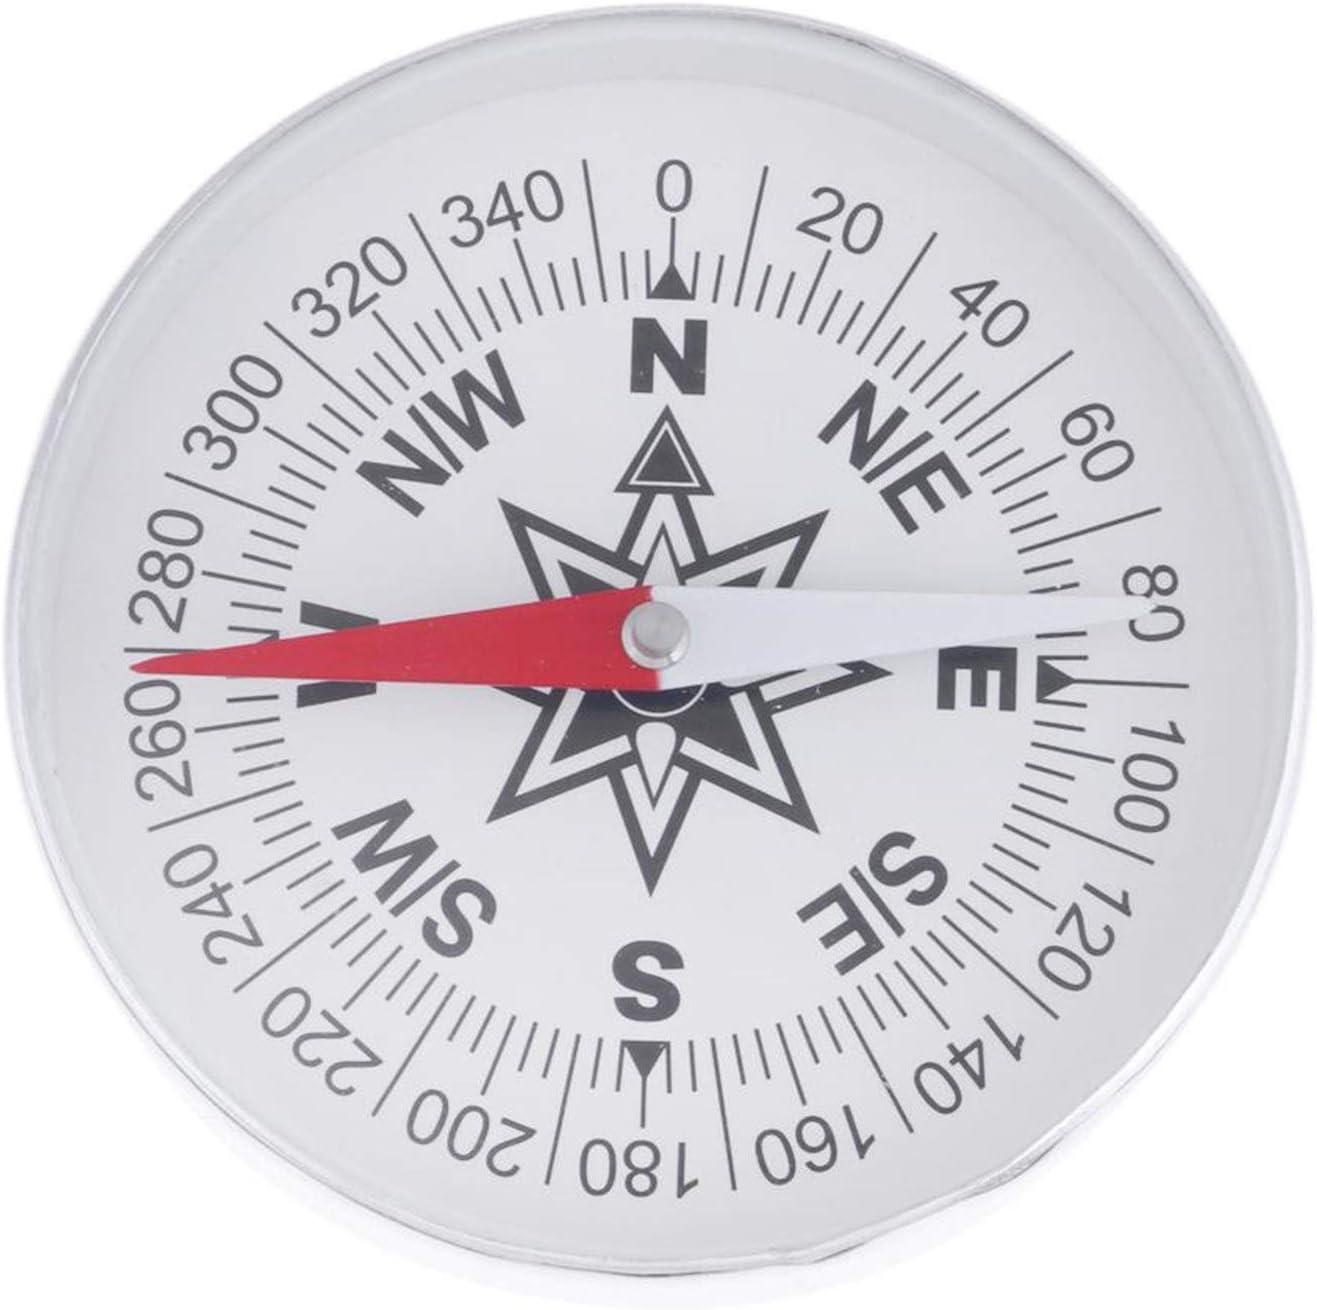 35% Max 69% OFF OFF LKYBOA Metal Survival Sighting Compass Waterproof Emergency Tool